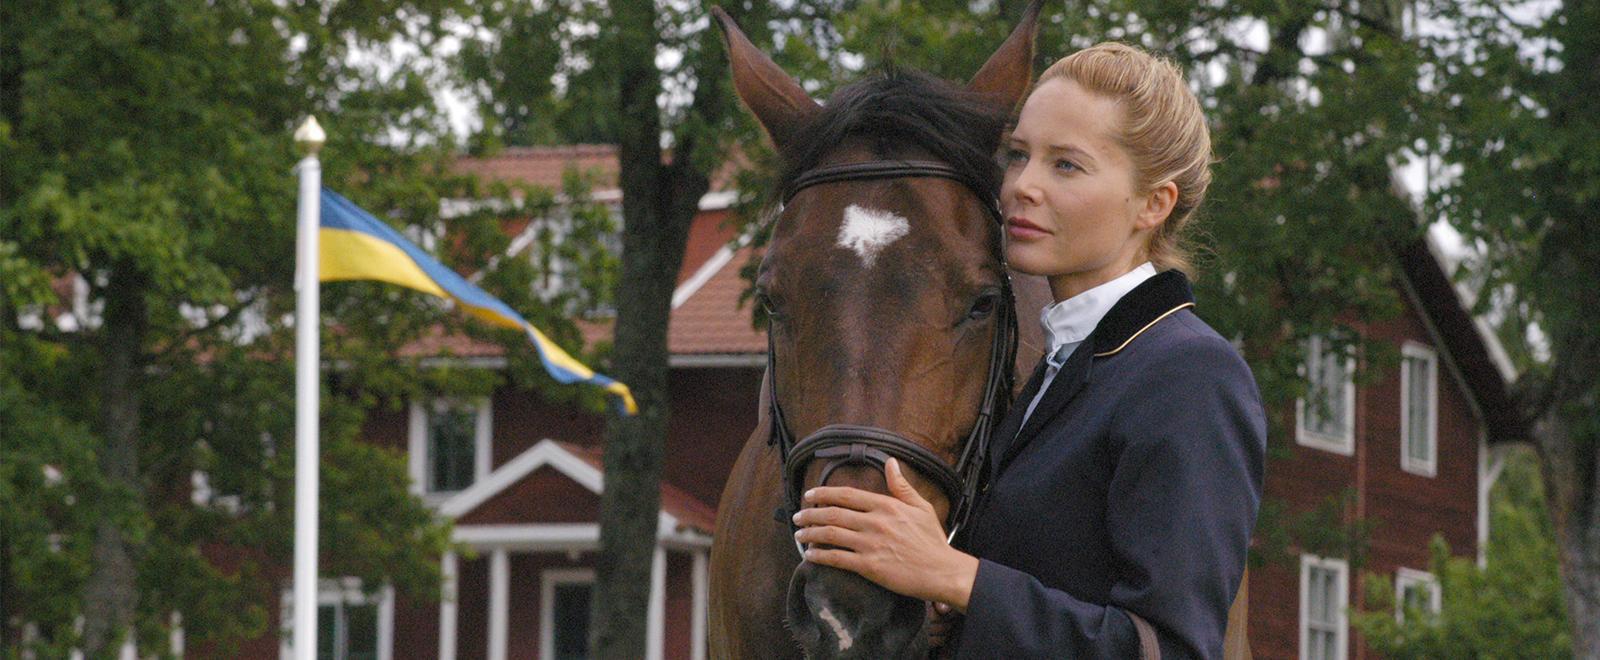 Inga Lindstrom - Un'accusa infamante